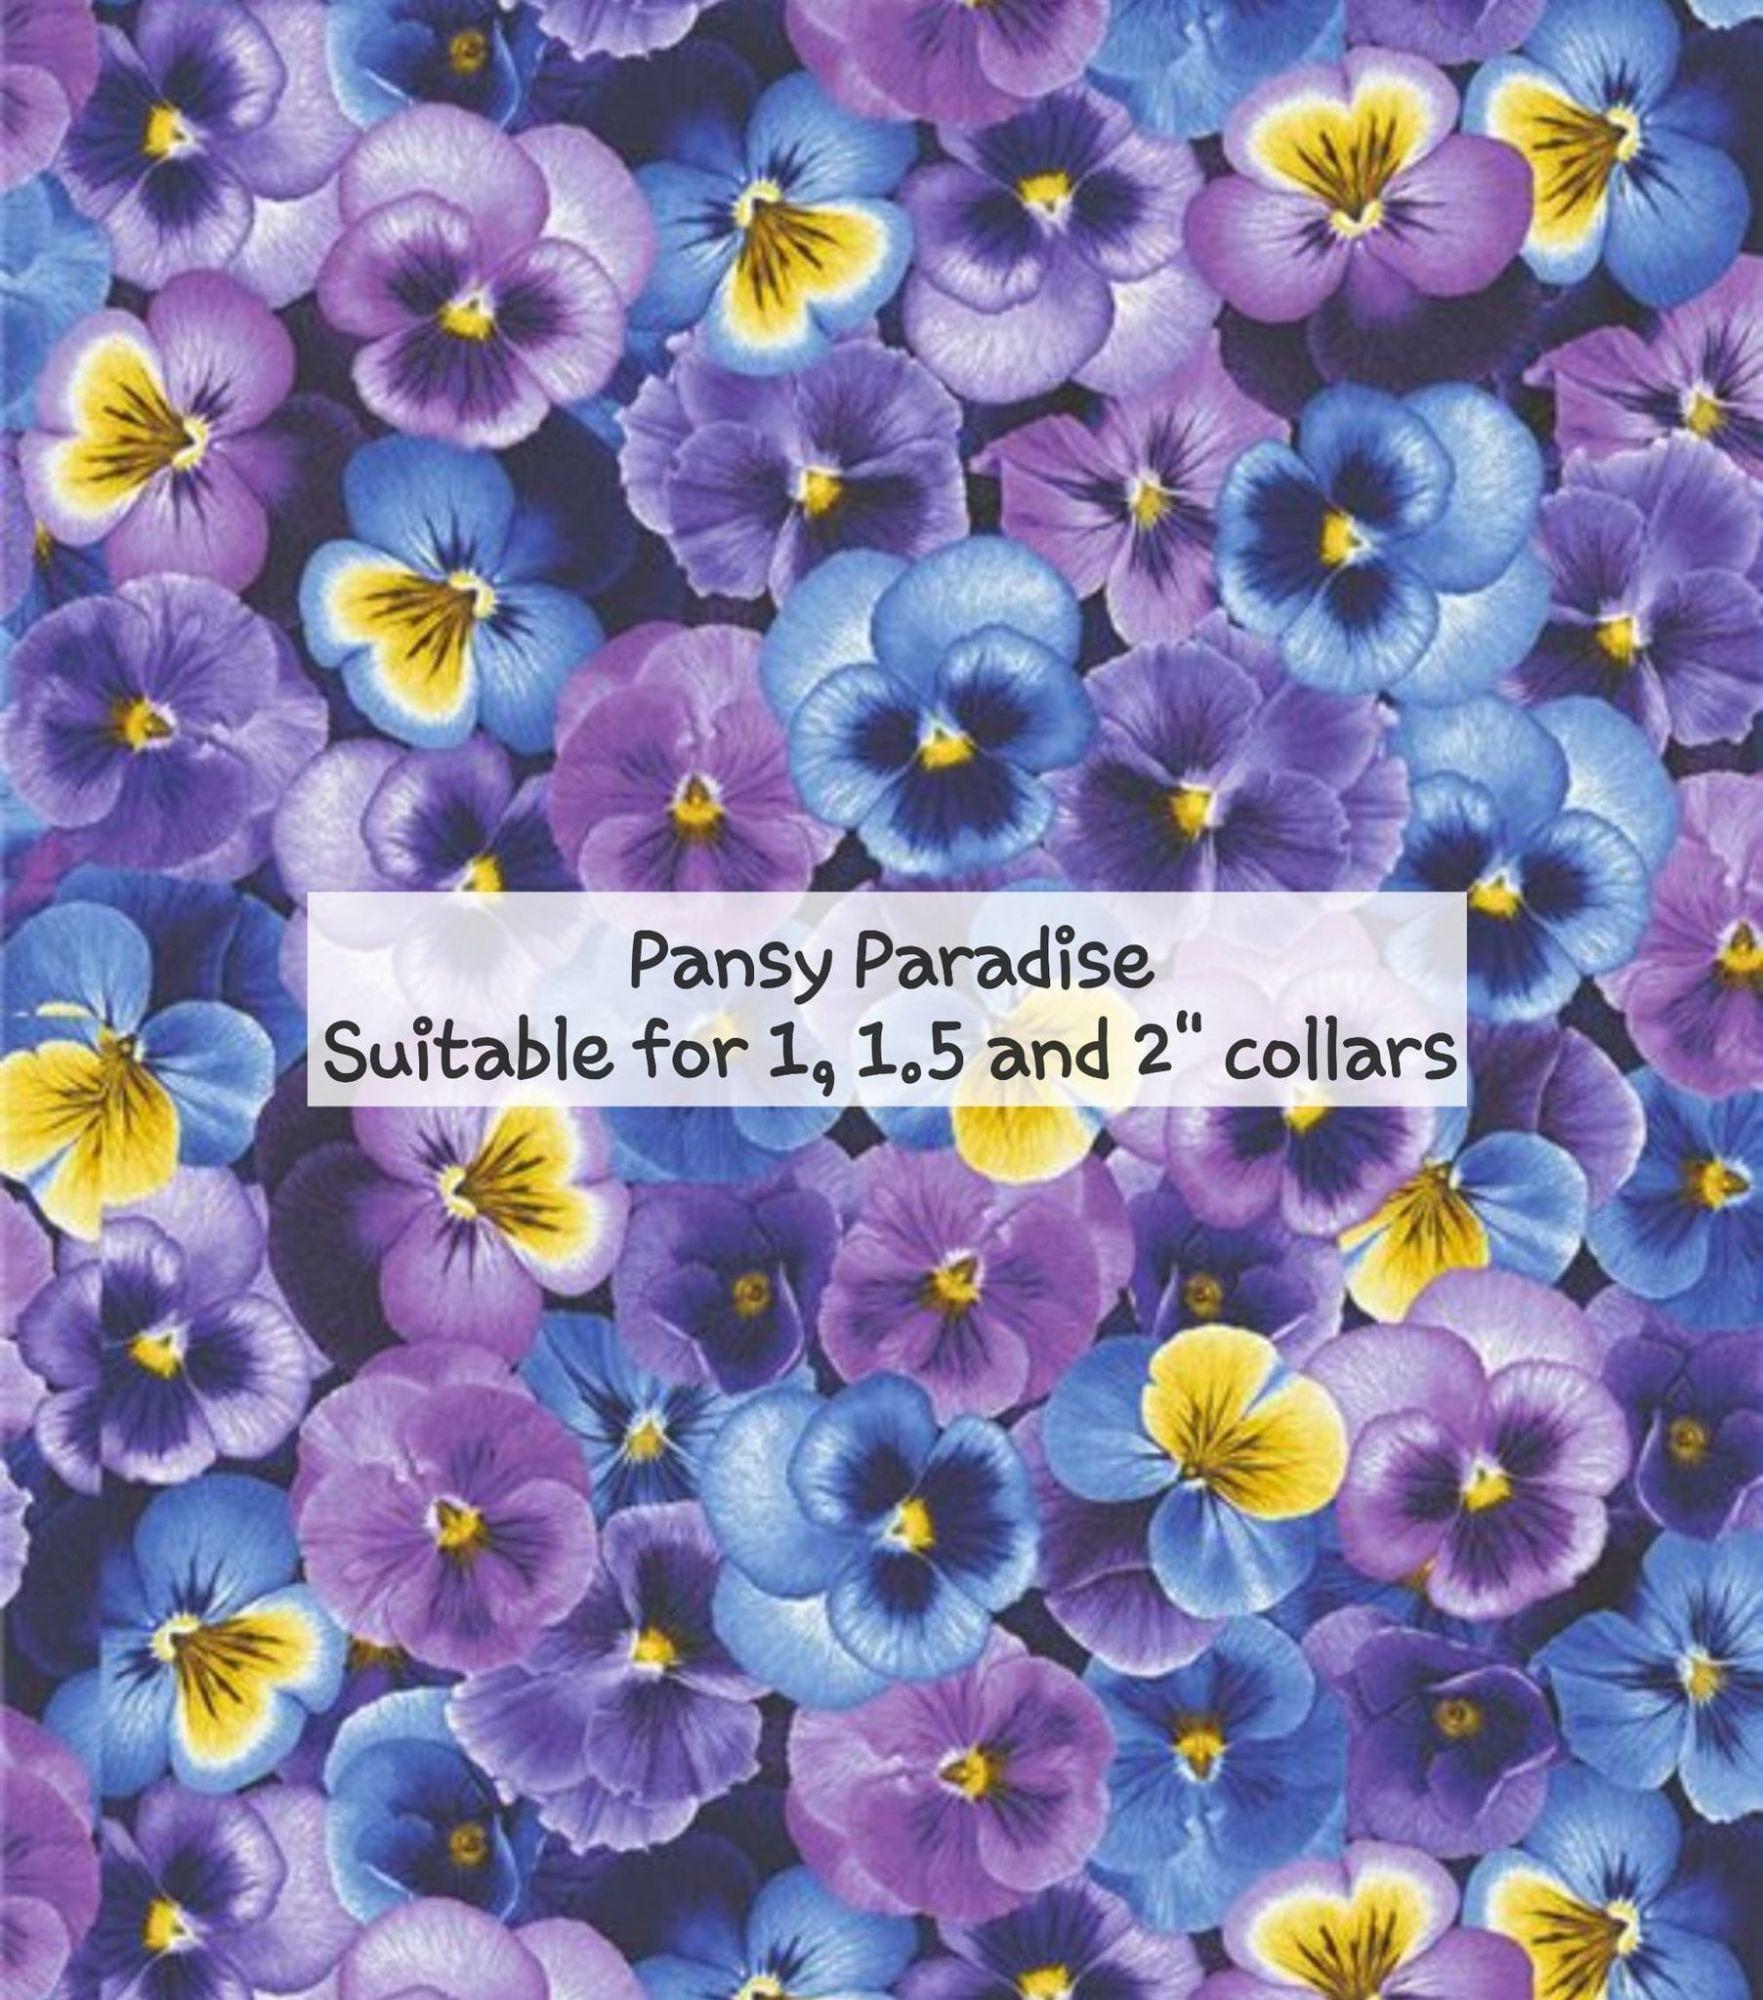 pansy paradise